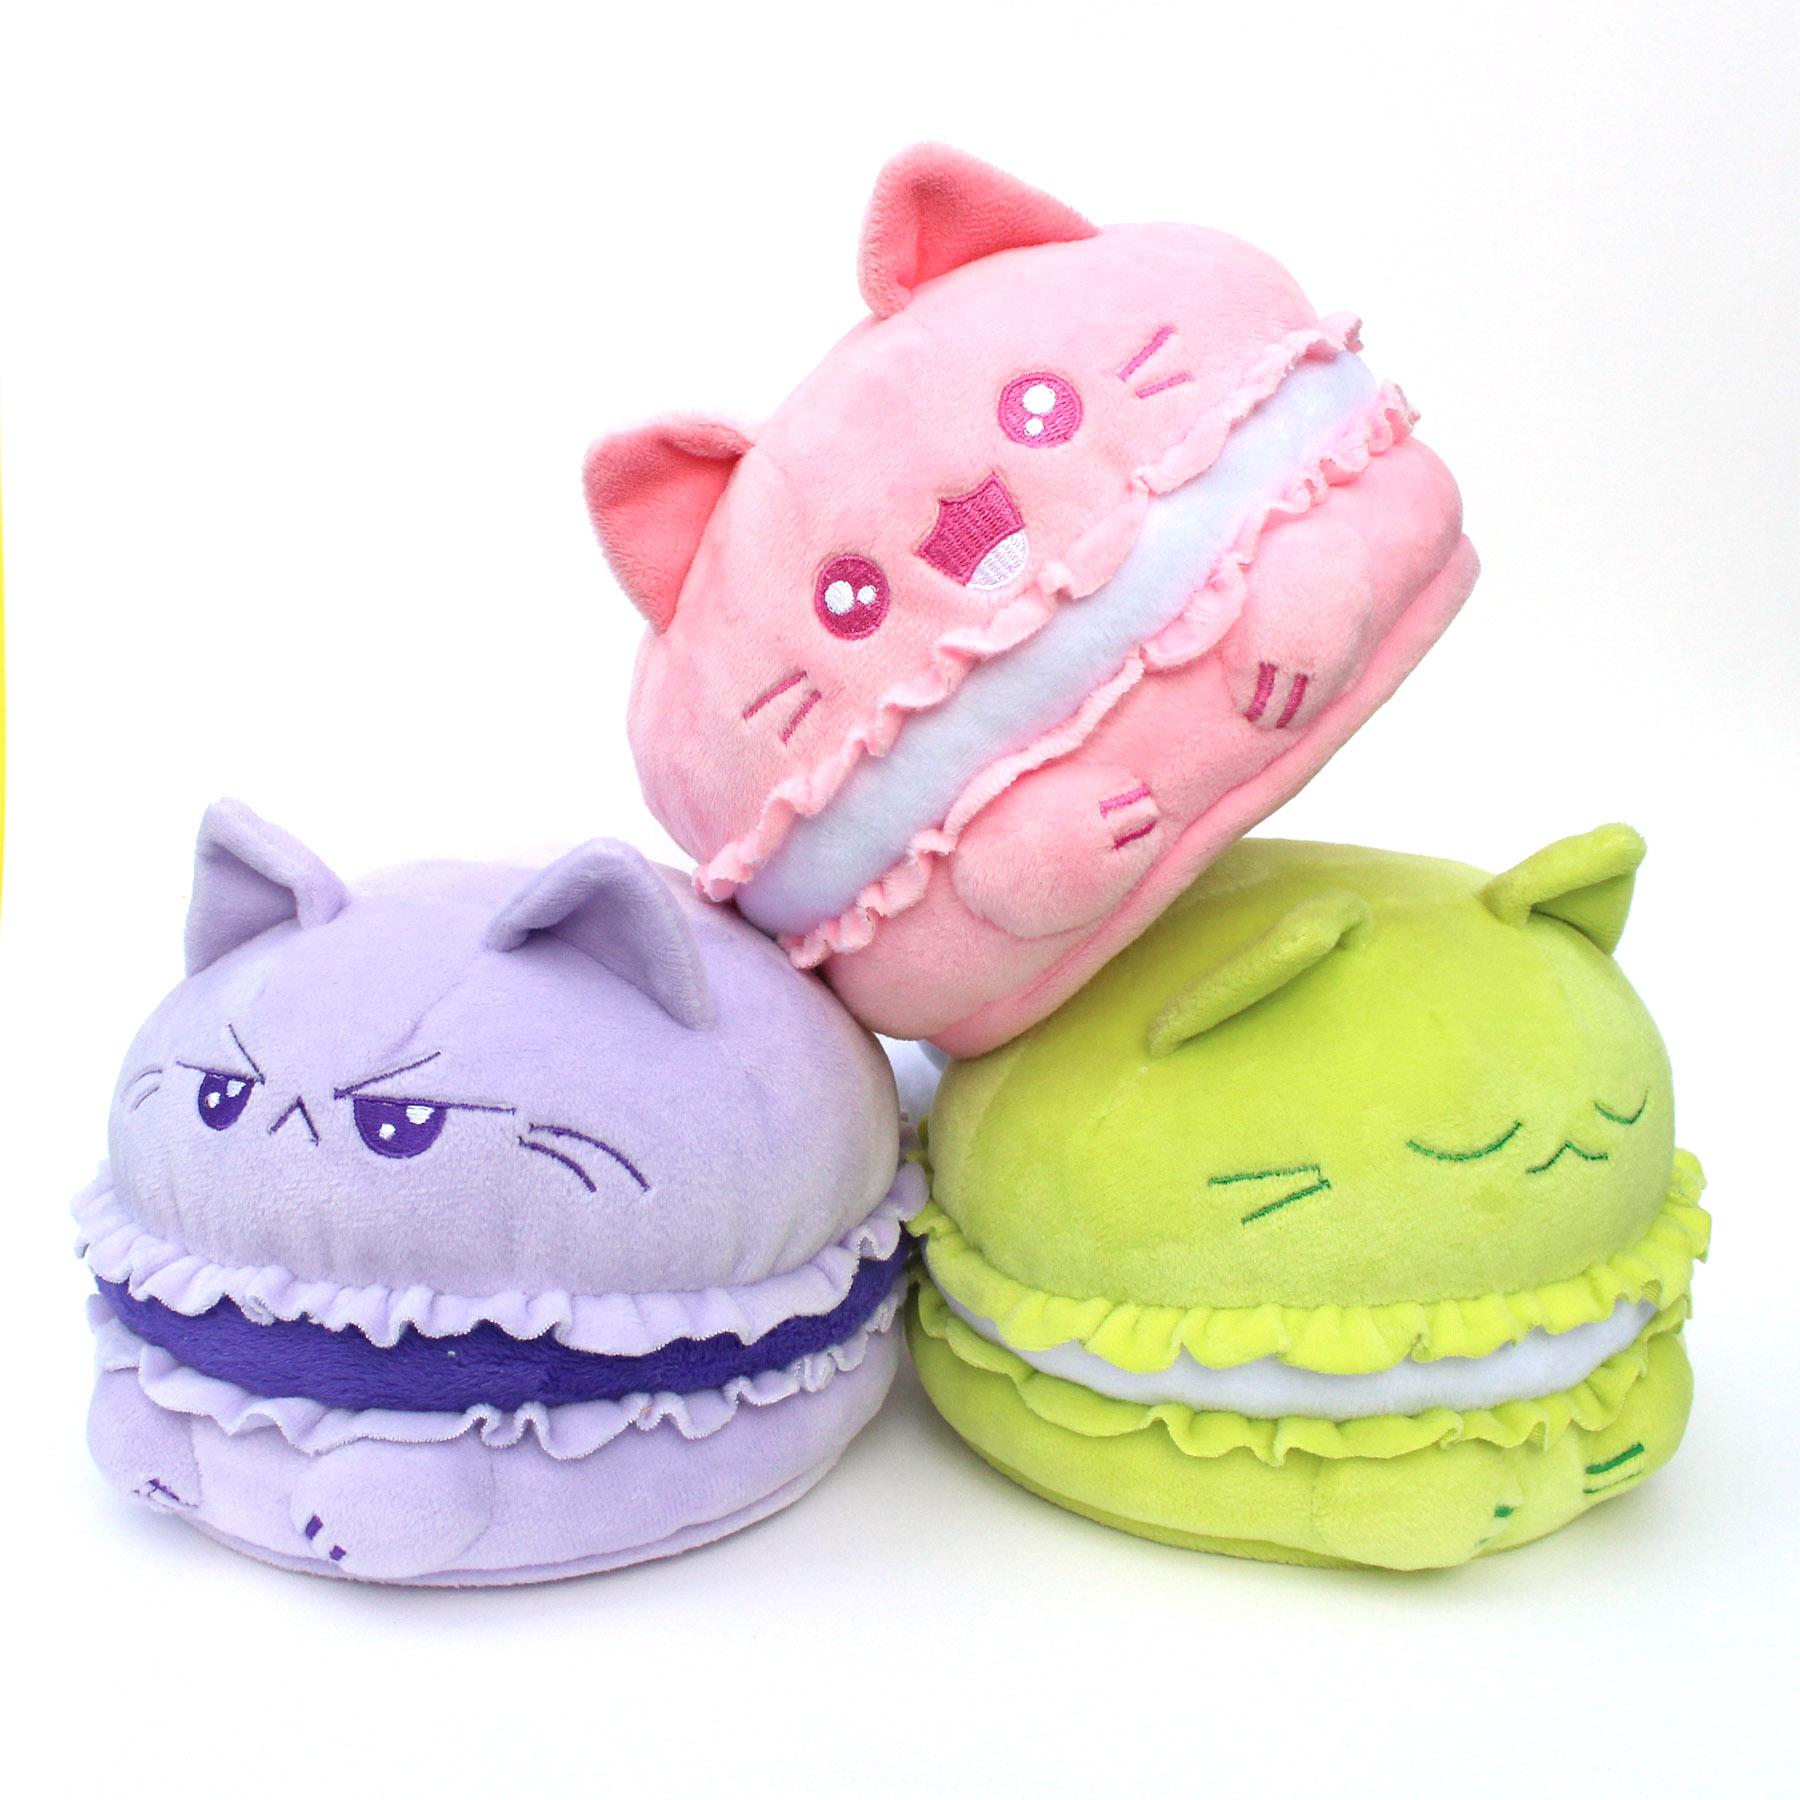 Purrista Pawfee Cute Mewcaron Kitty Cat Plush On Storenvy